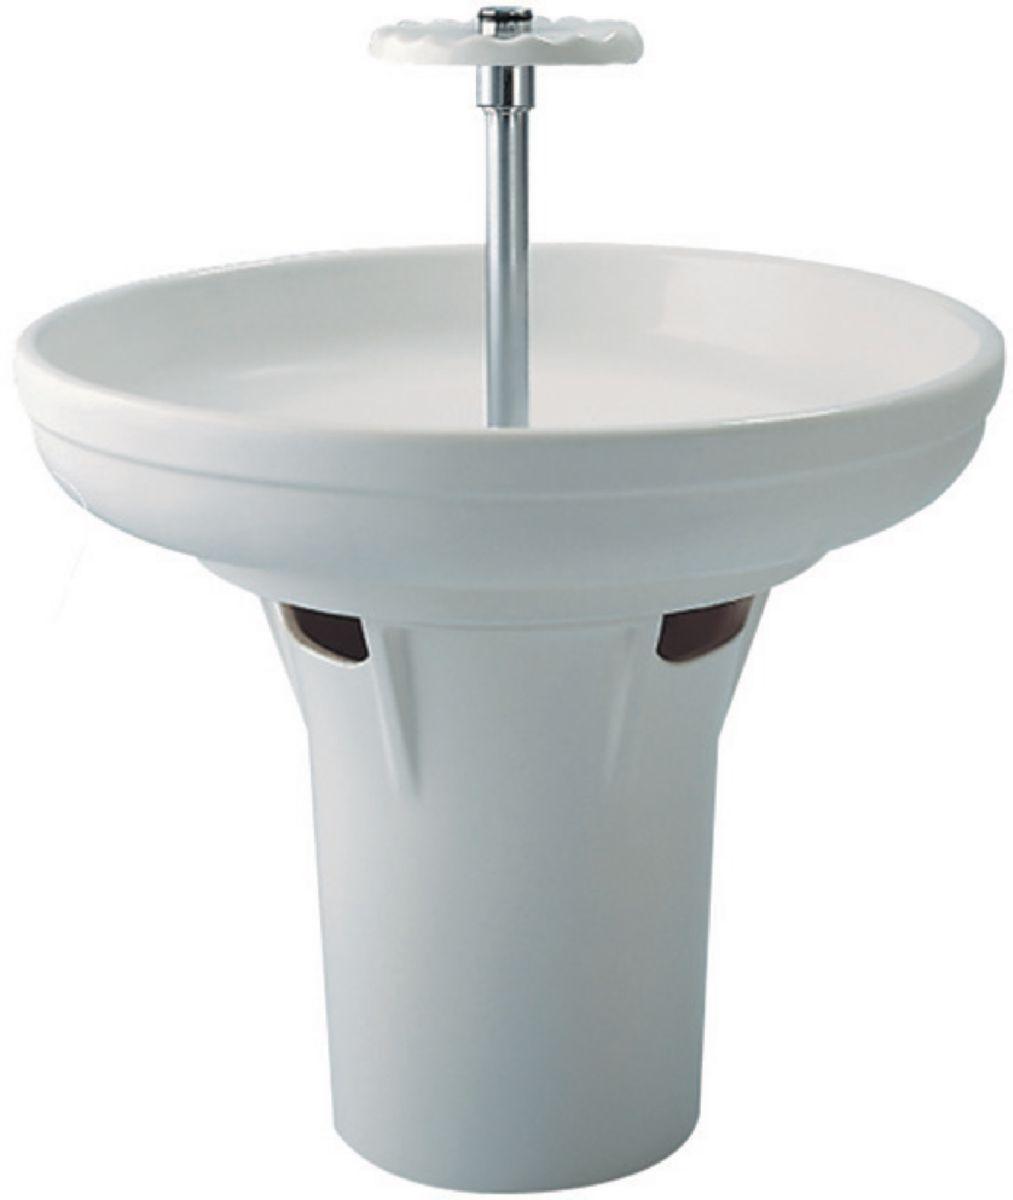 Awesome pied pour lavabo circulaire hauteur cm blanc rf p for Evier tradition villeroy et boch